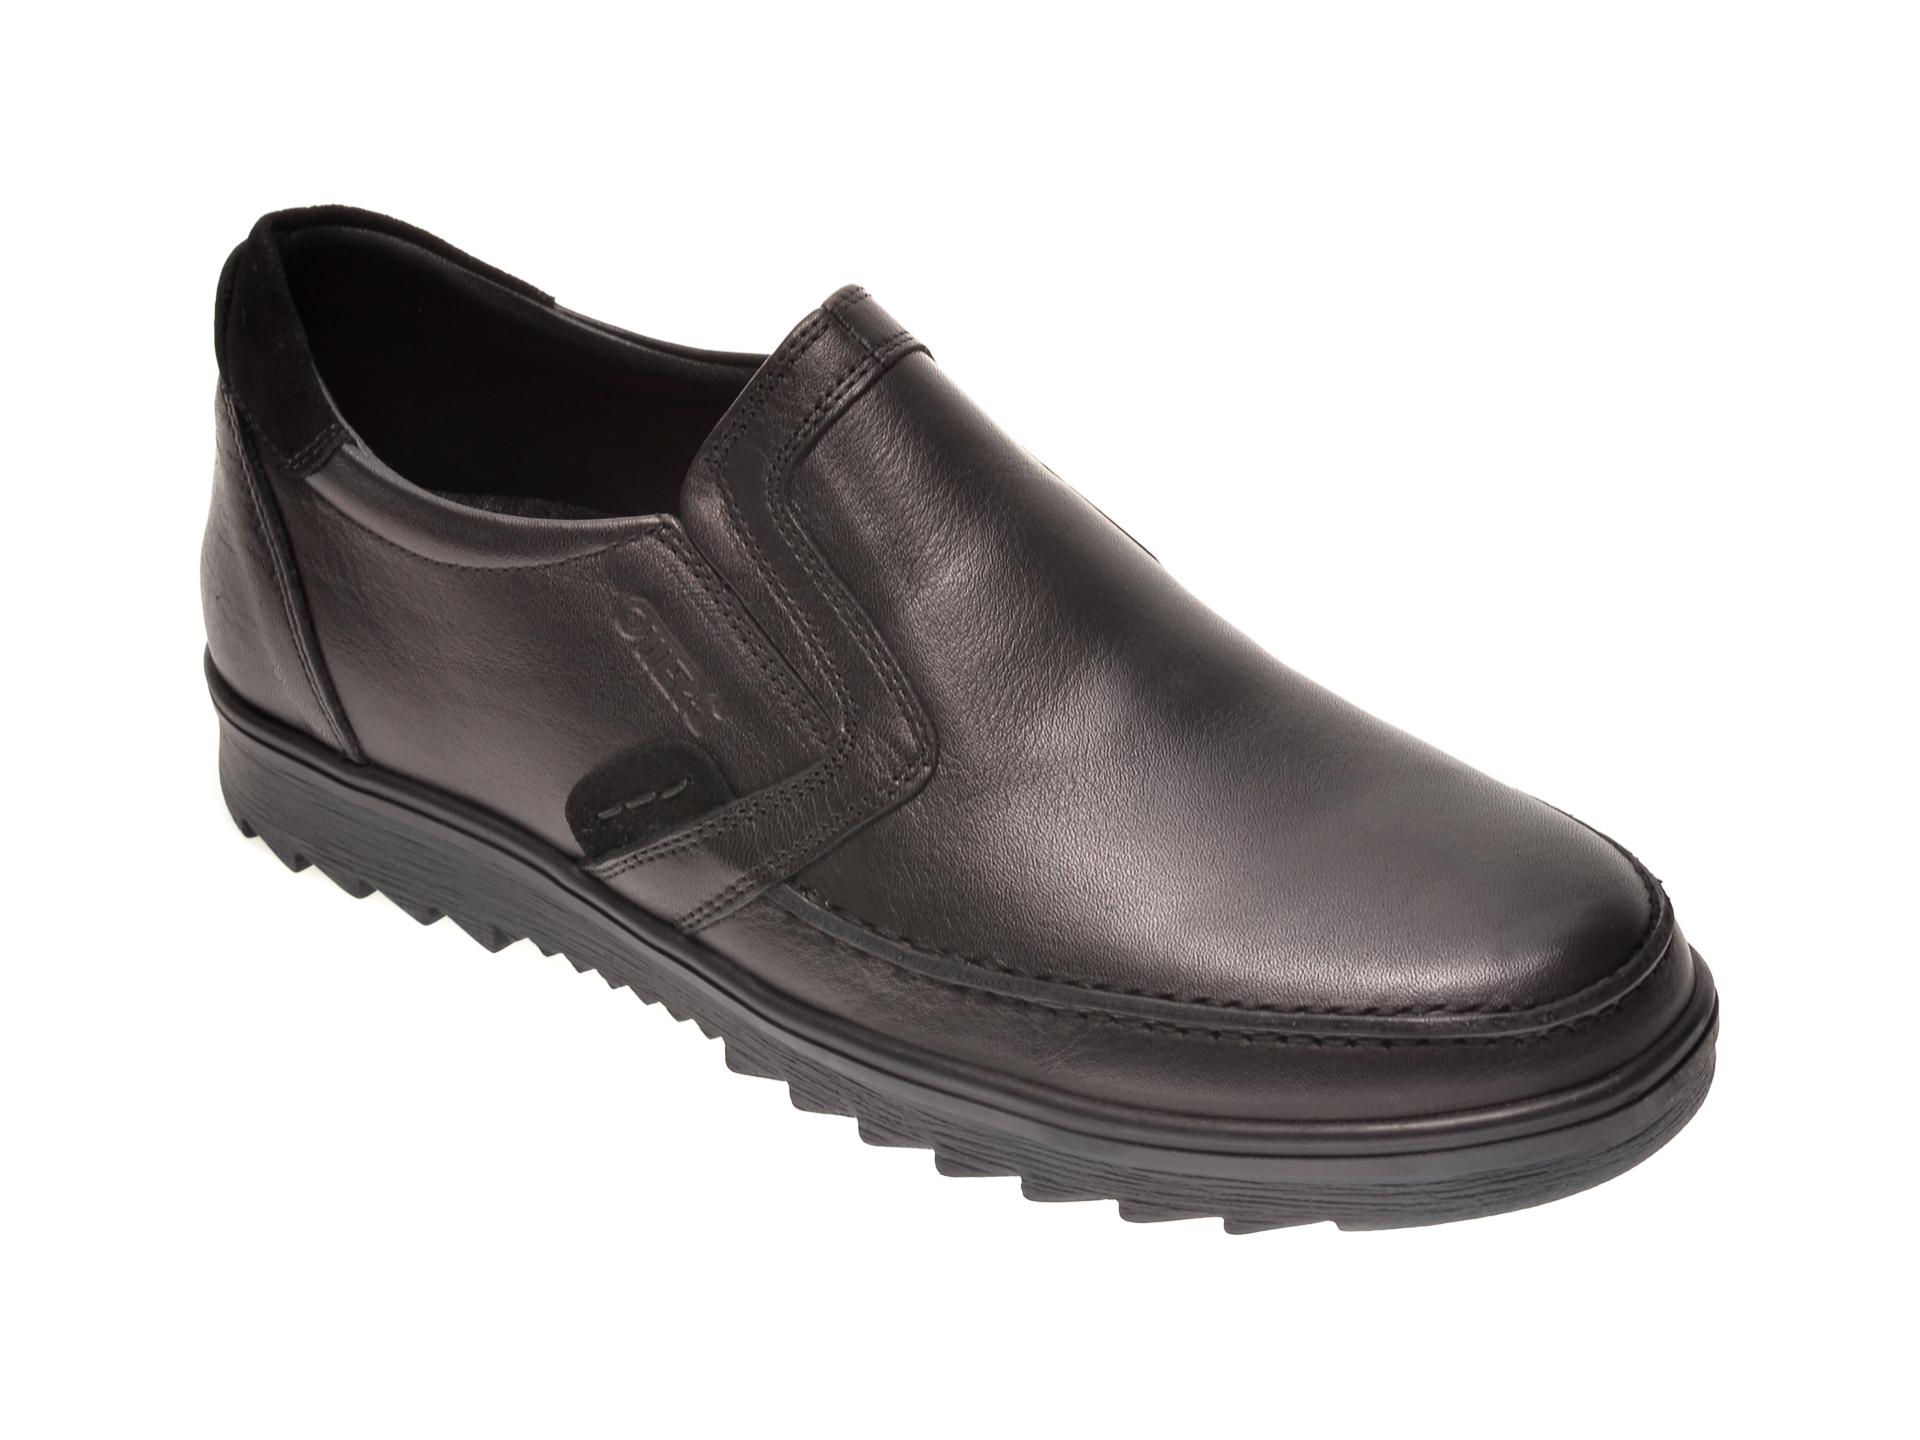 Pantofi OTTER negri, T9, din piele naturala New